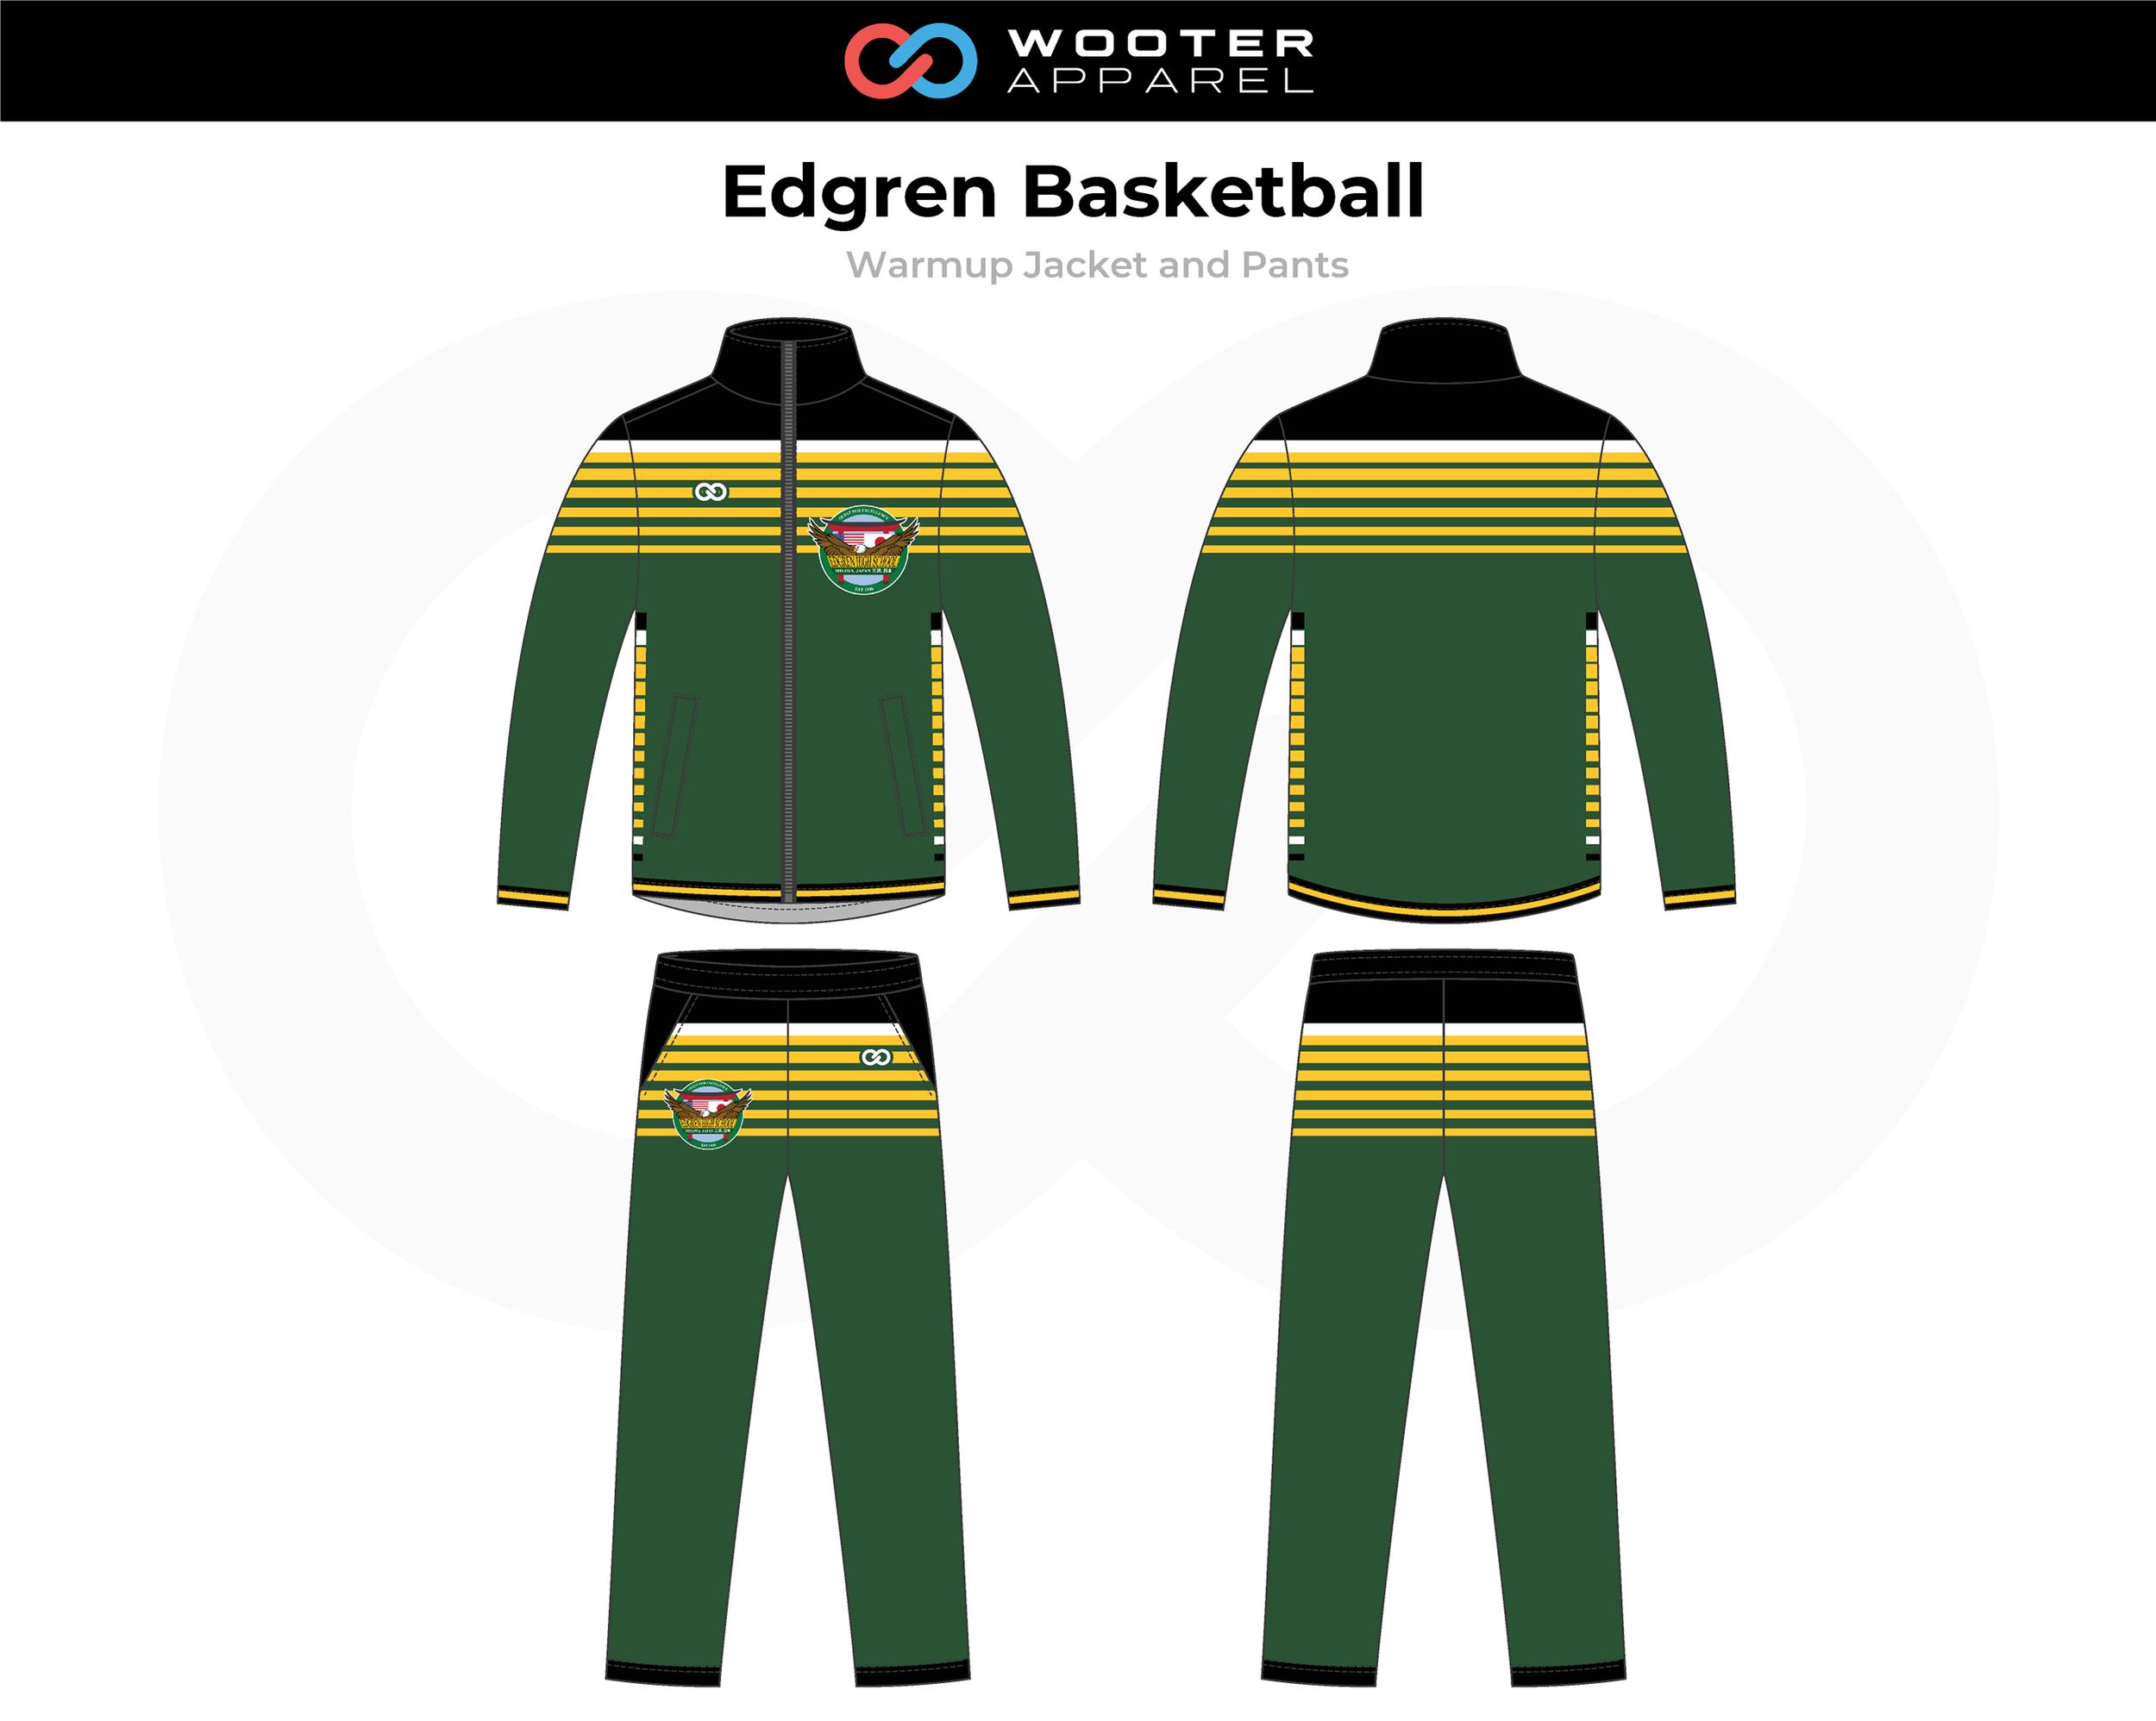 2019-02-27 Edgren High School Warmup Jacket and Pants (Team KC).png